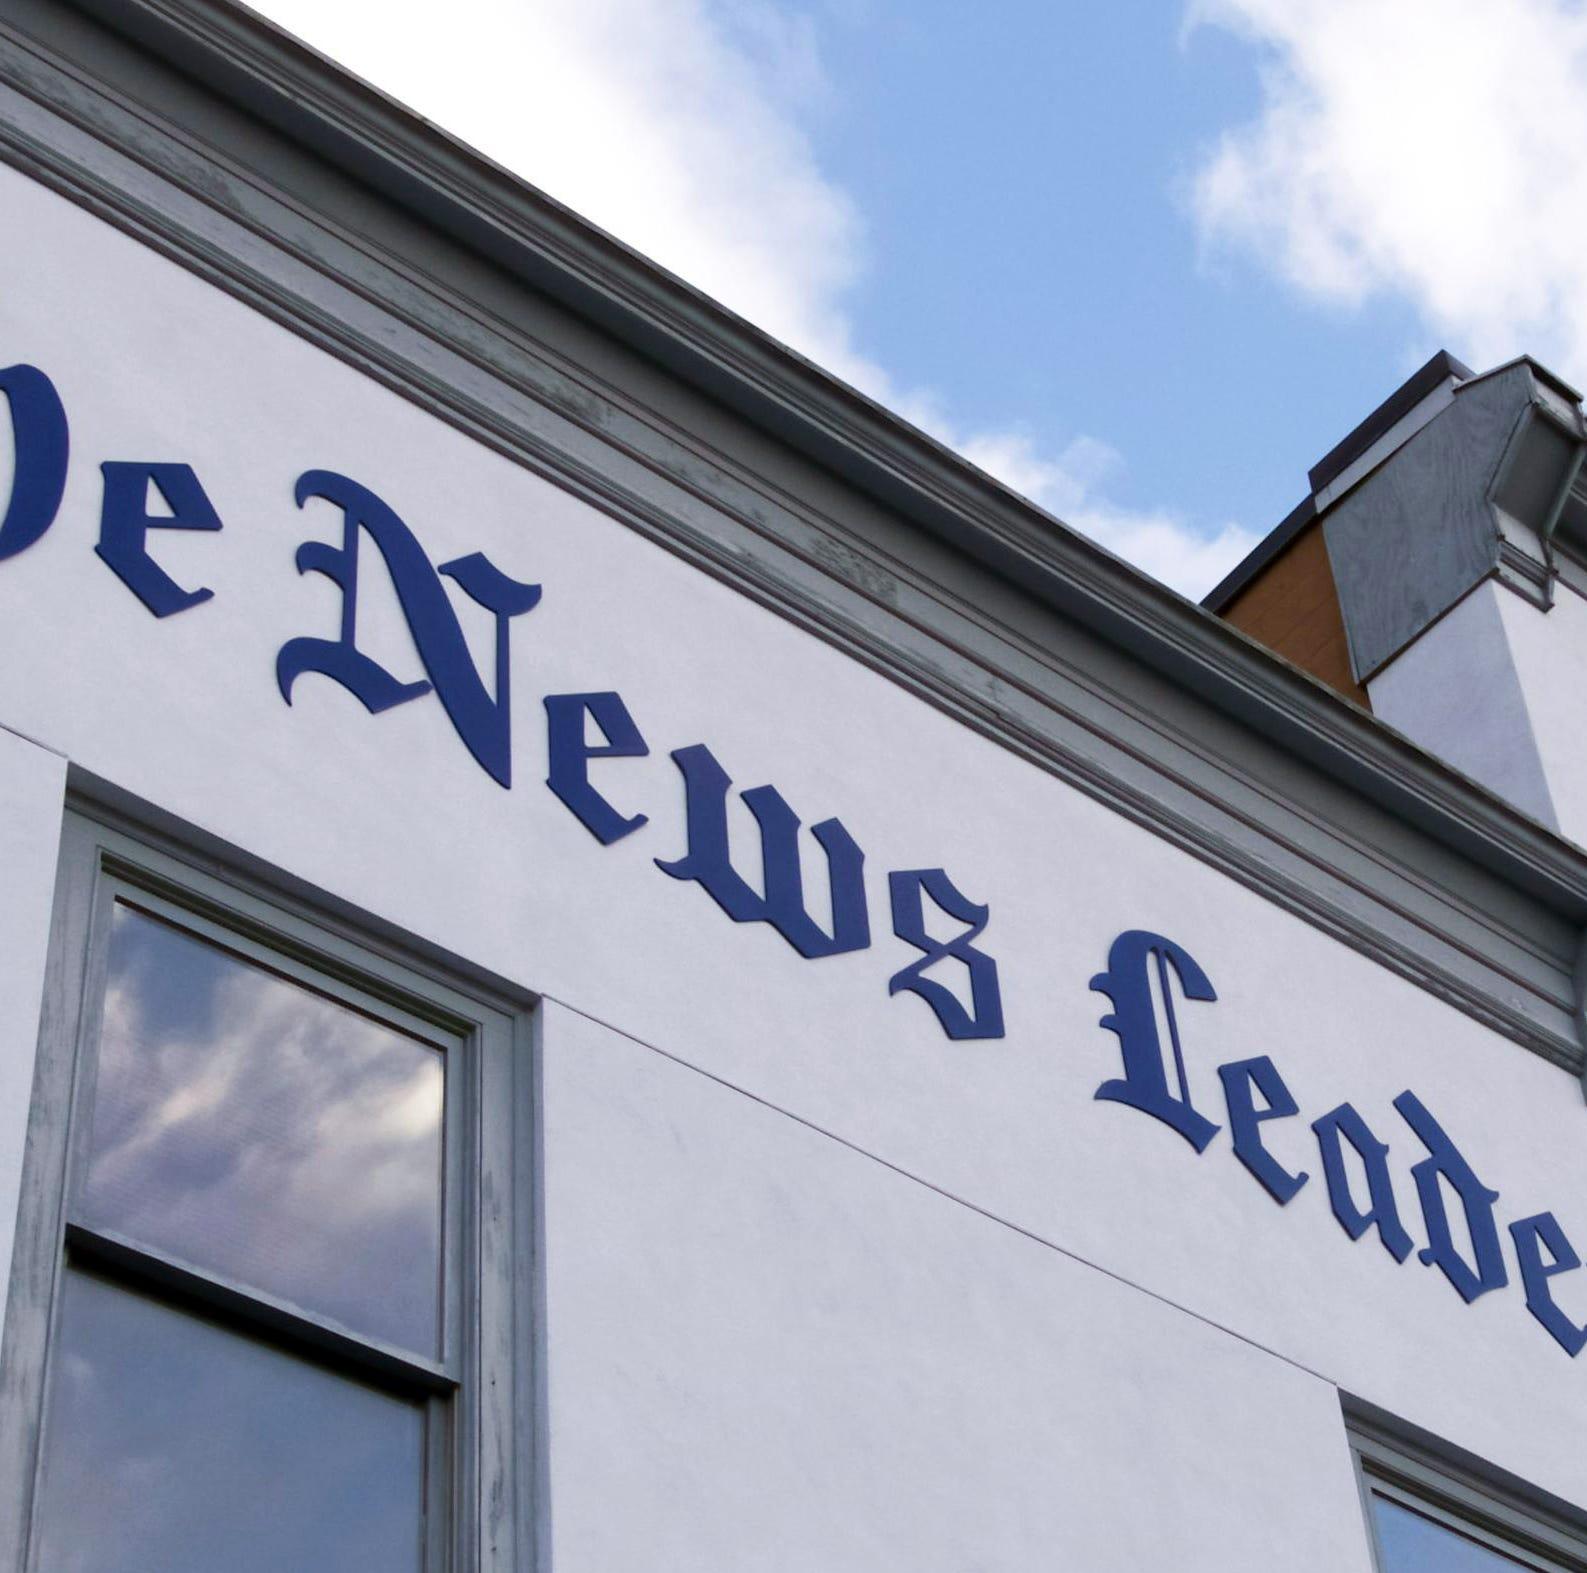 Staunton newsroom leadership change: Fritz promoted to regional job, Ramsey new Leader editor